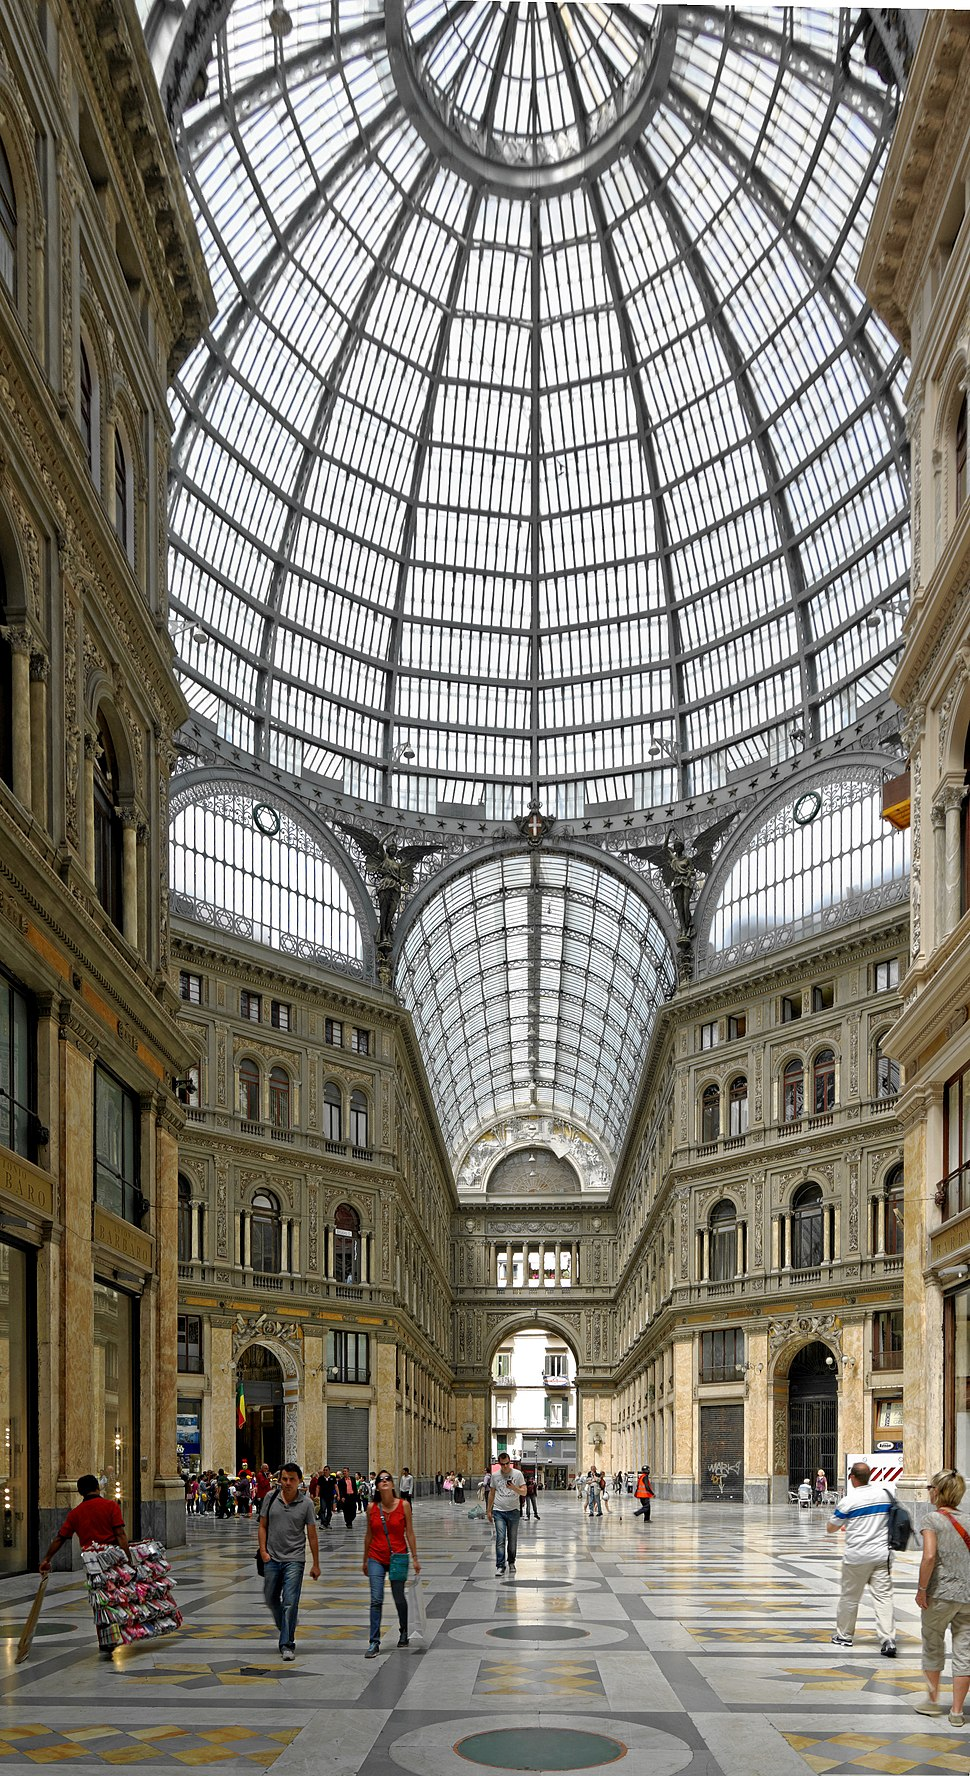 Inside of Galleria Umberto I - Naples 2013-05-16 14-11-46 1 DxO